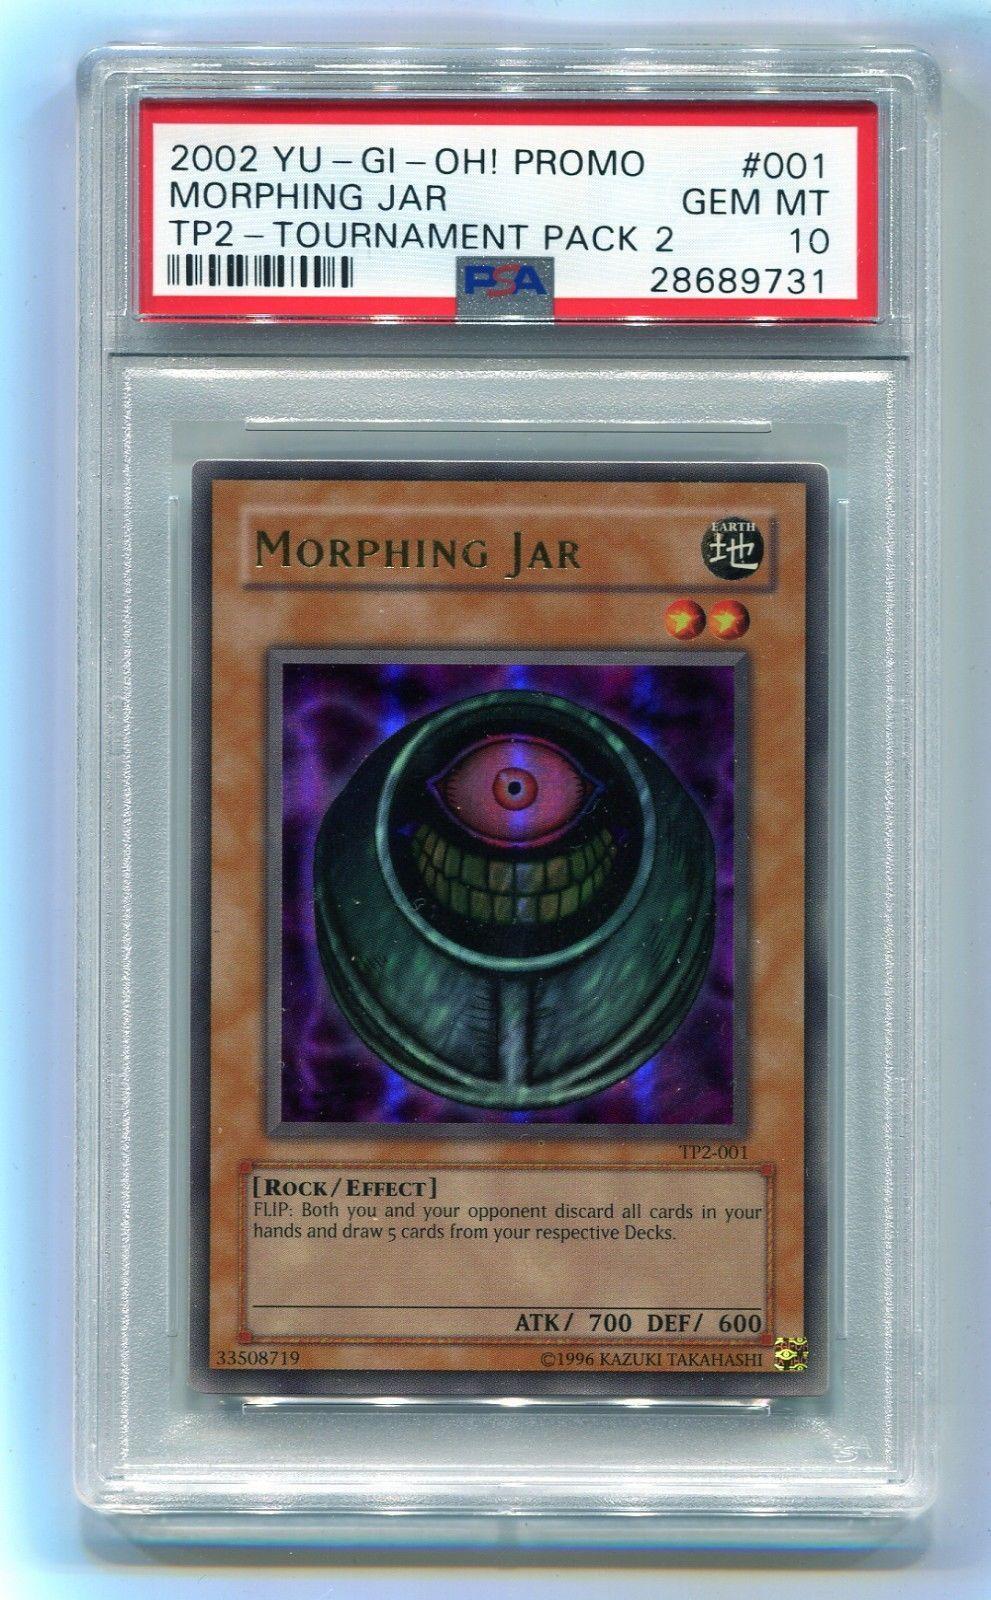 2002 yugioh tournament pack 2 morphing jar tp2001